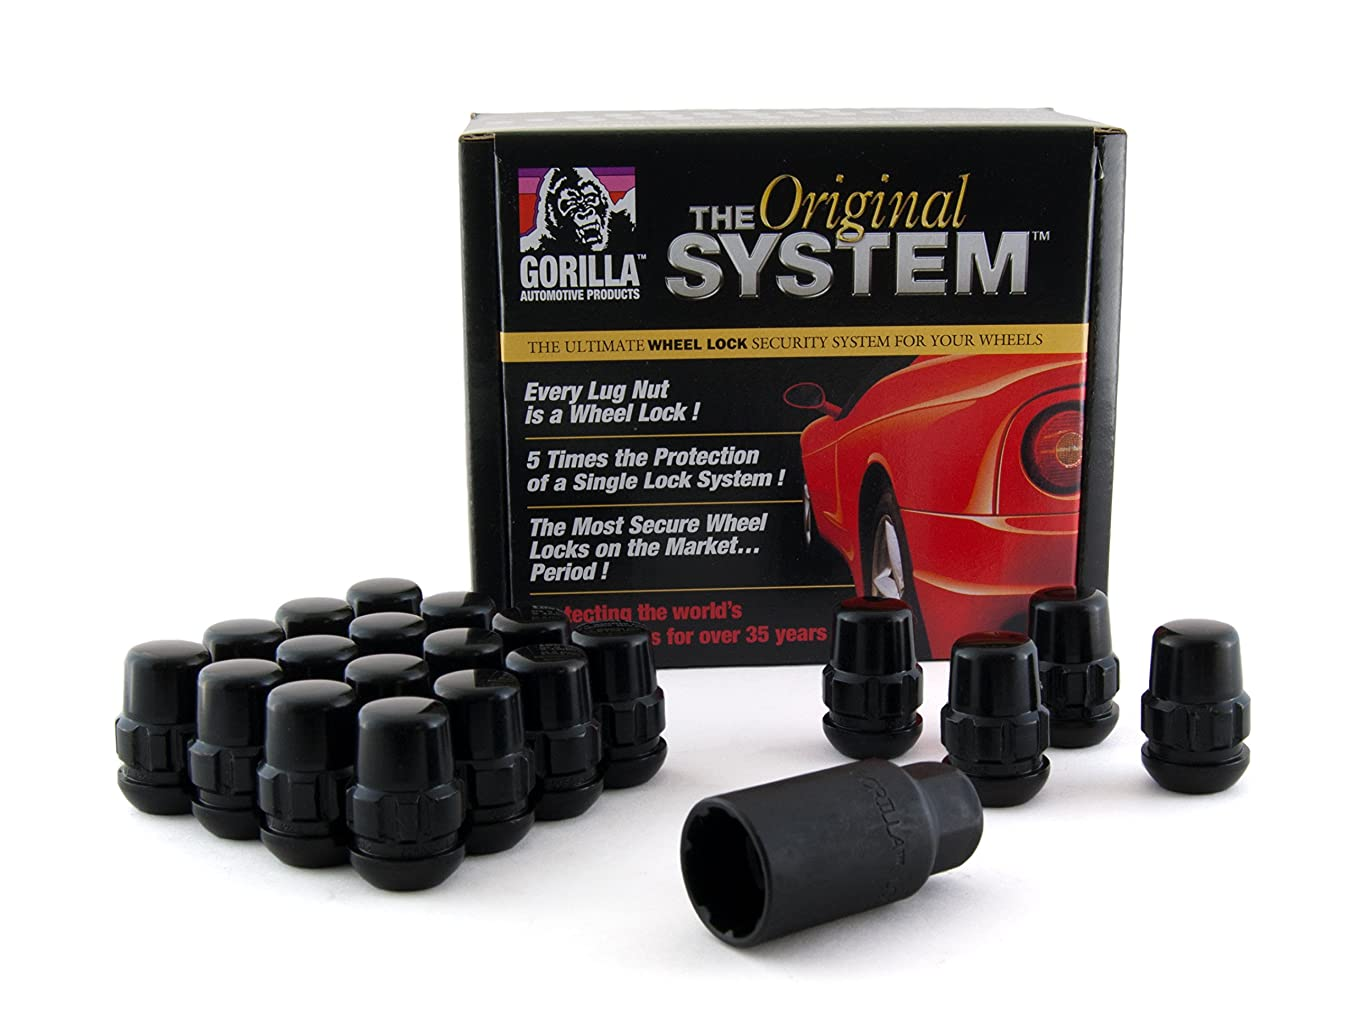 Gorilla Automotive Products 38433XLBC Ball Seat Wheel Lock System Black Chrome Set of 20 (12mm x 1.50 Thread)